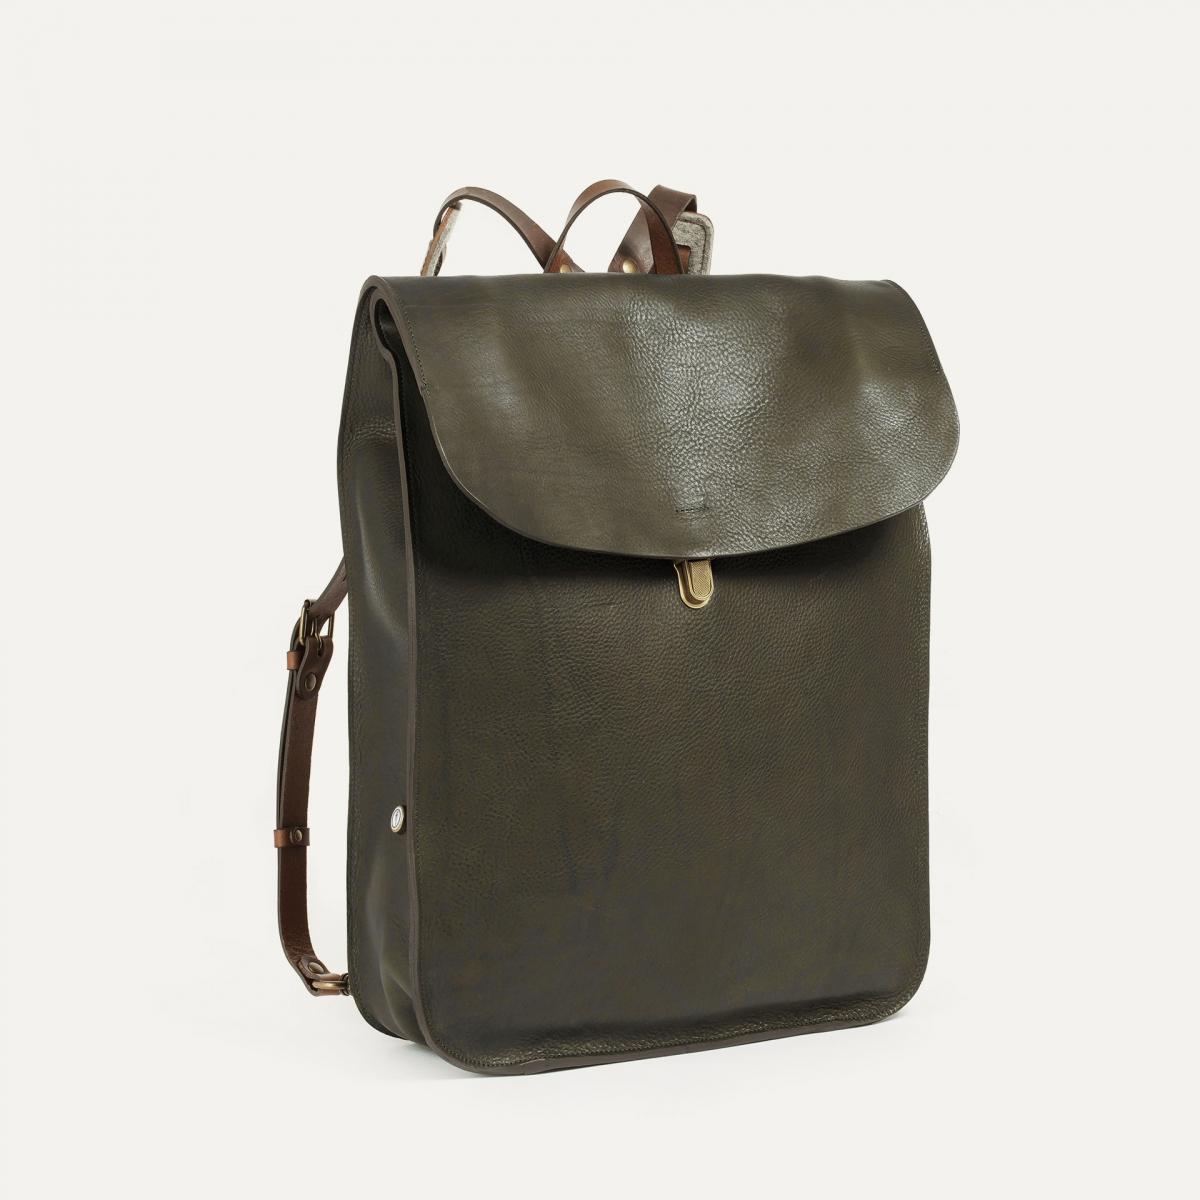 Arlo leather backpack - Khaki / E Pure (image n°2)